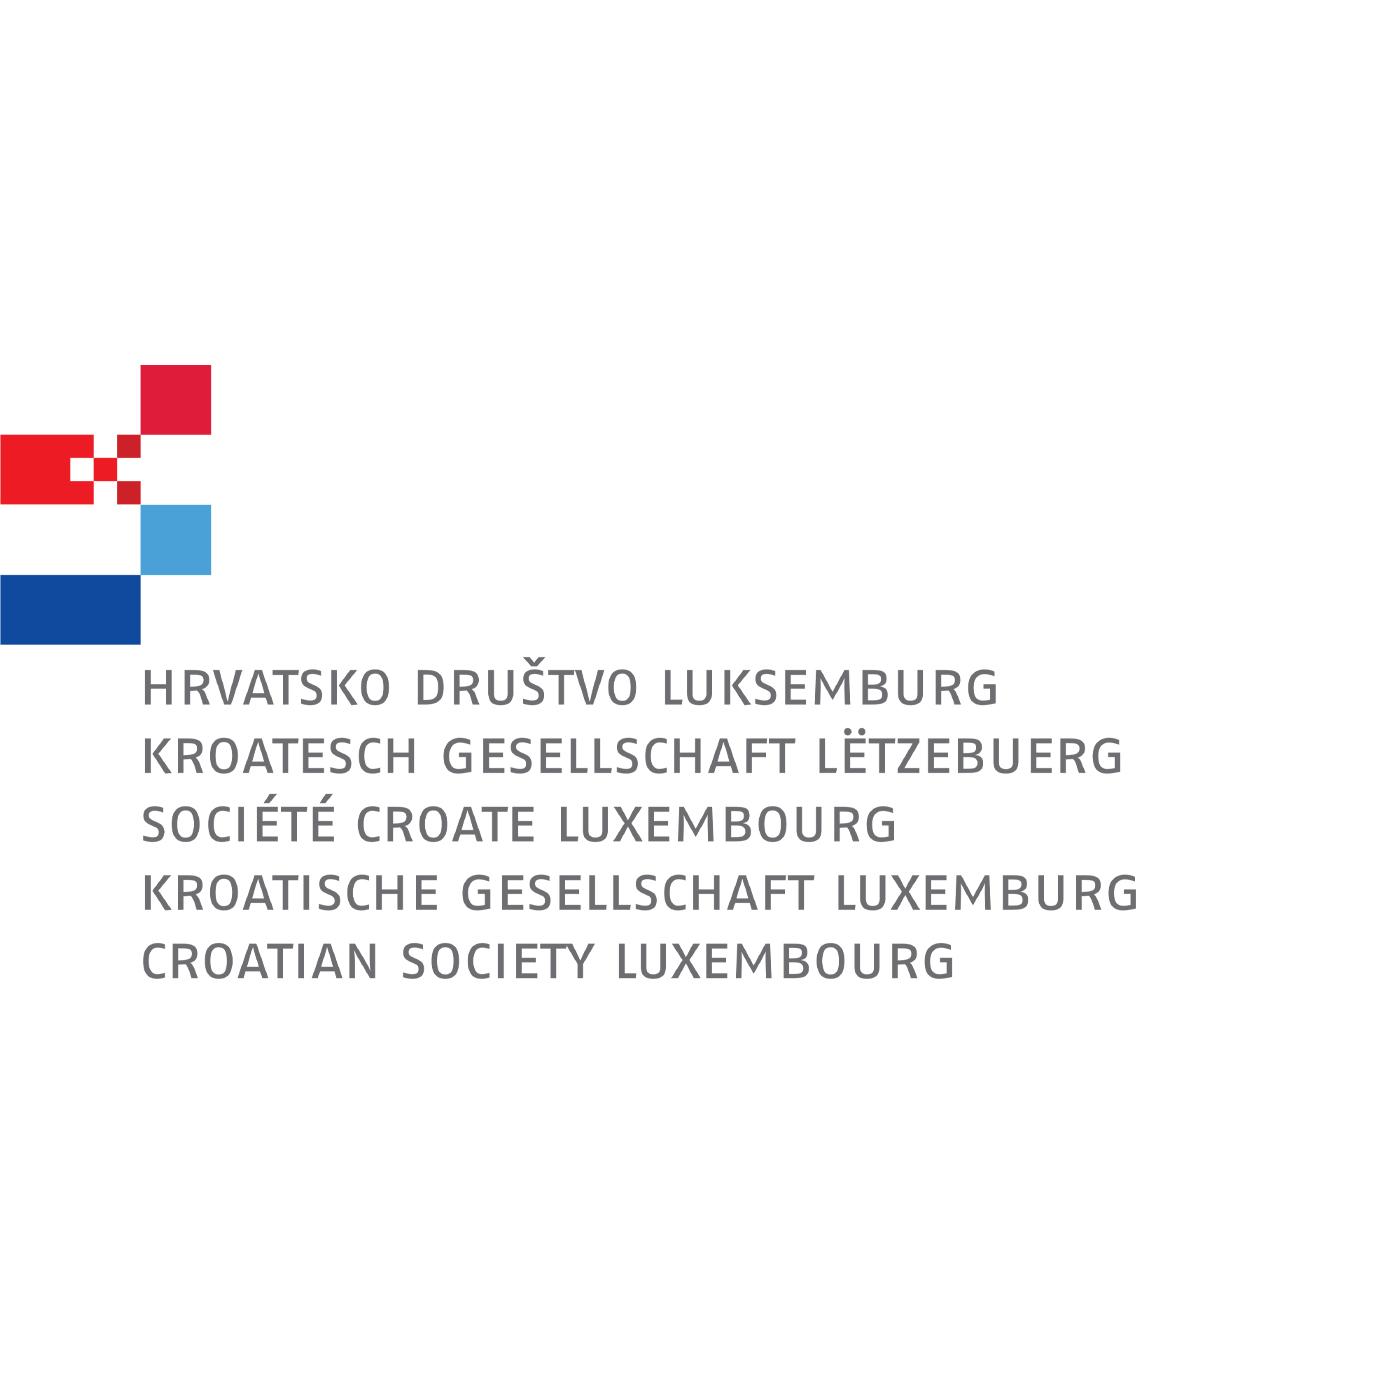 Croatian Society Luxembourg